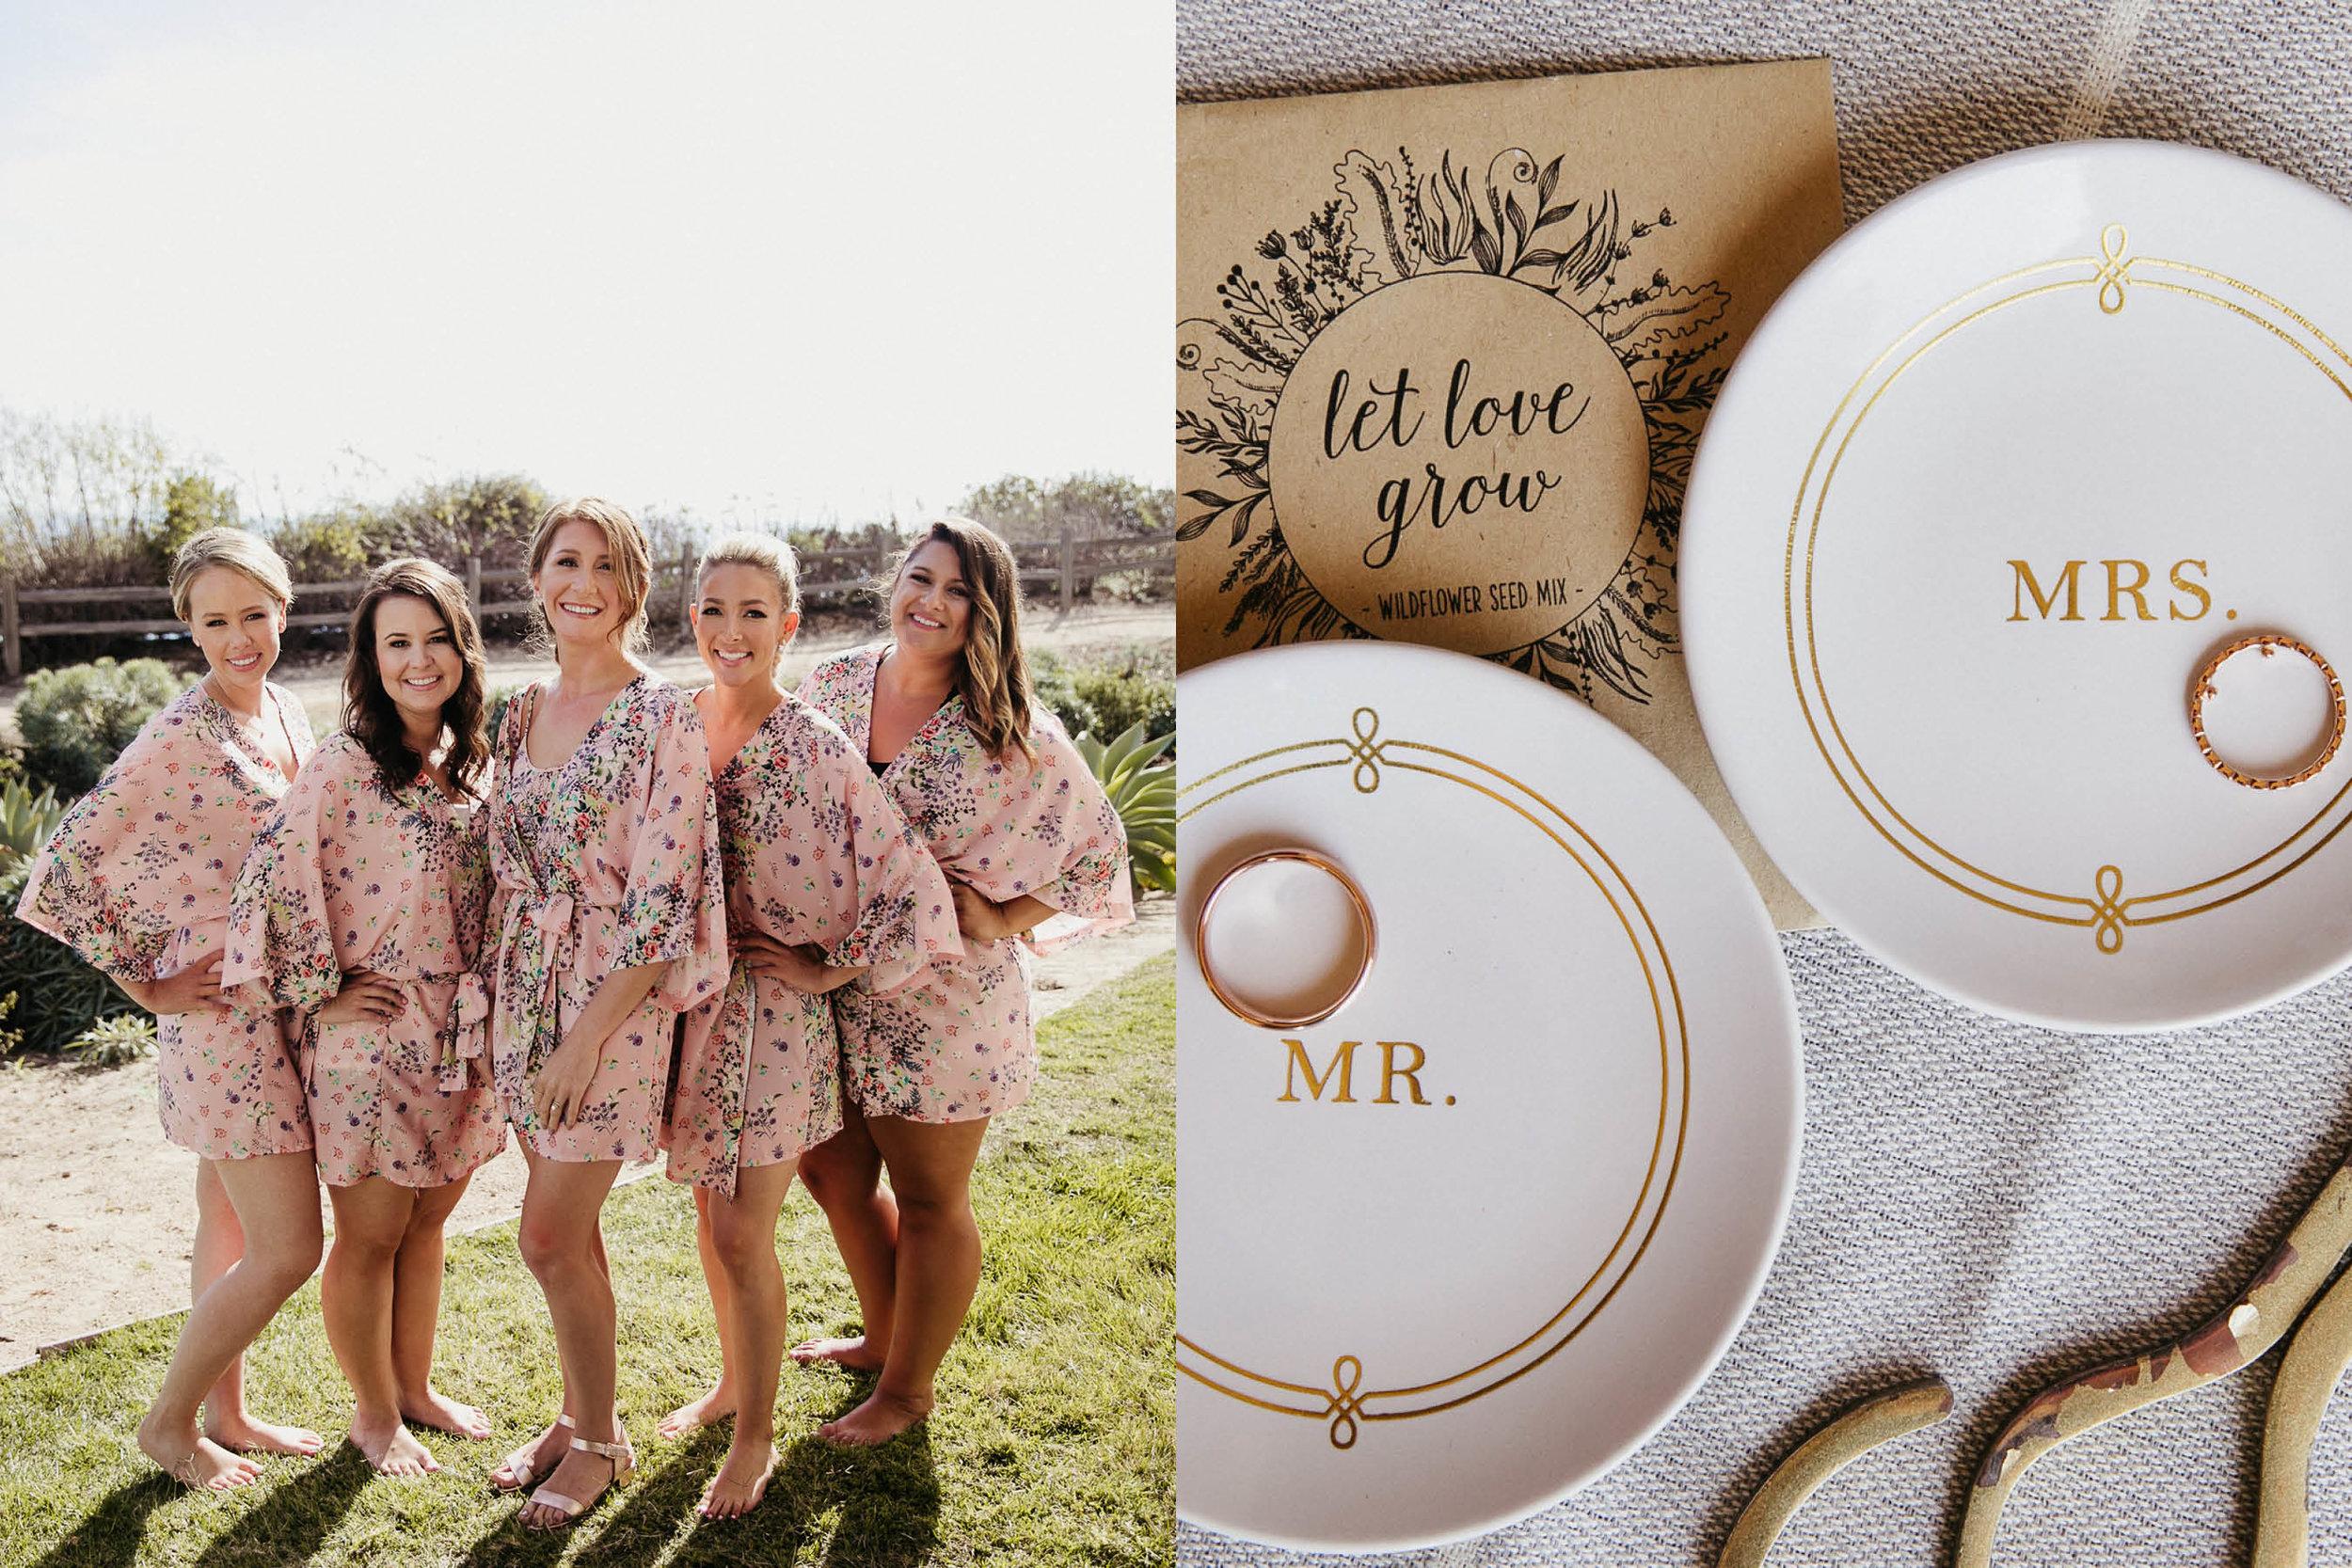 santa-barbara-elopement-wedding-planner-planning-coordinator-day-of-ellwood-bluff-ocean-front-view-bacara-resort-ritz-carlton-porsche-downtown (6).jpg